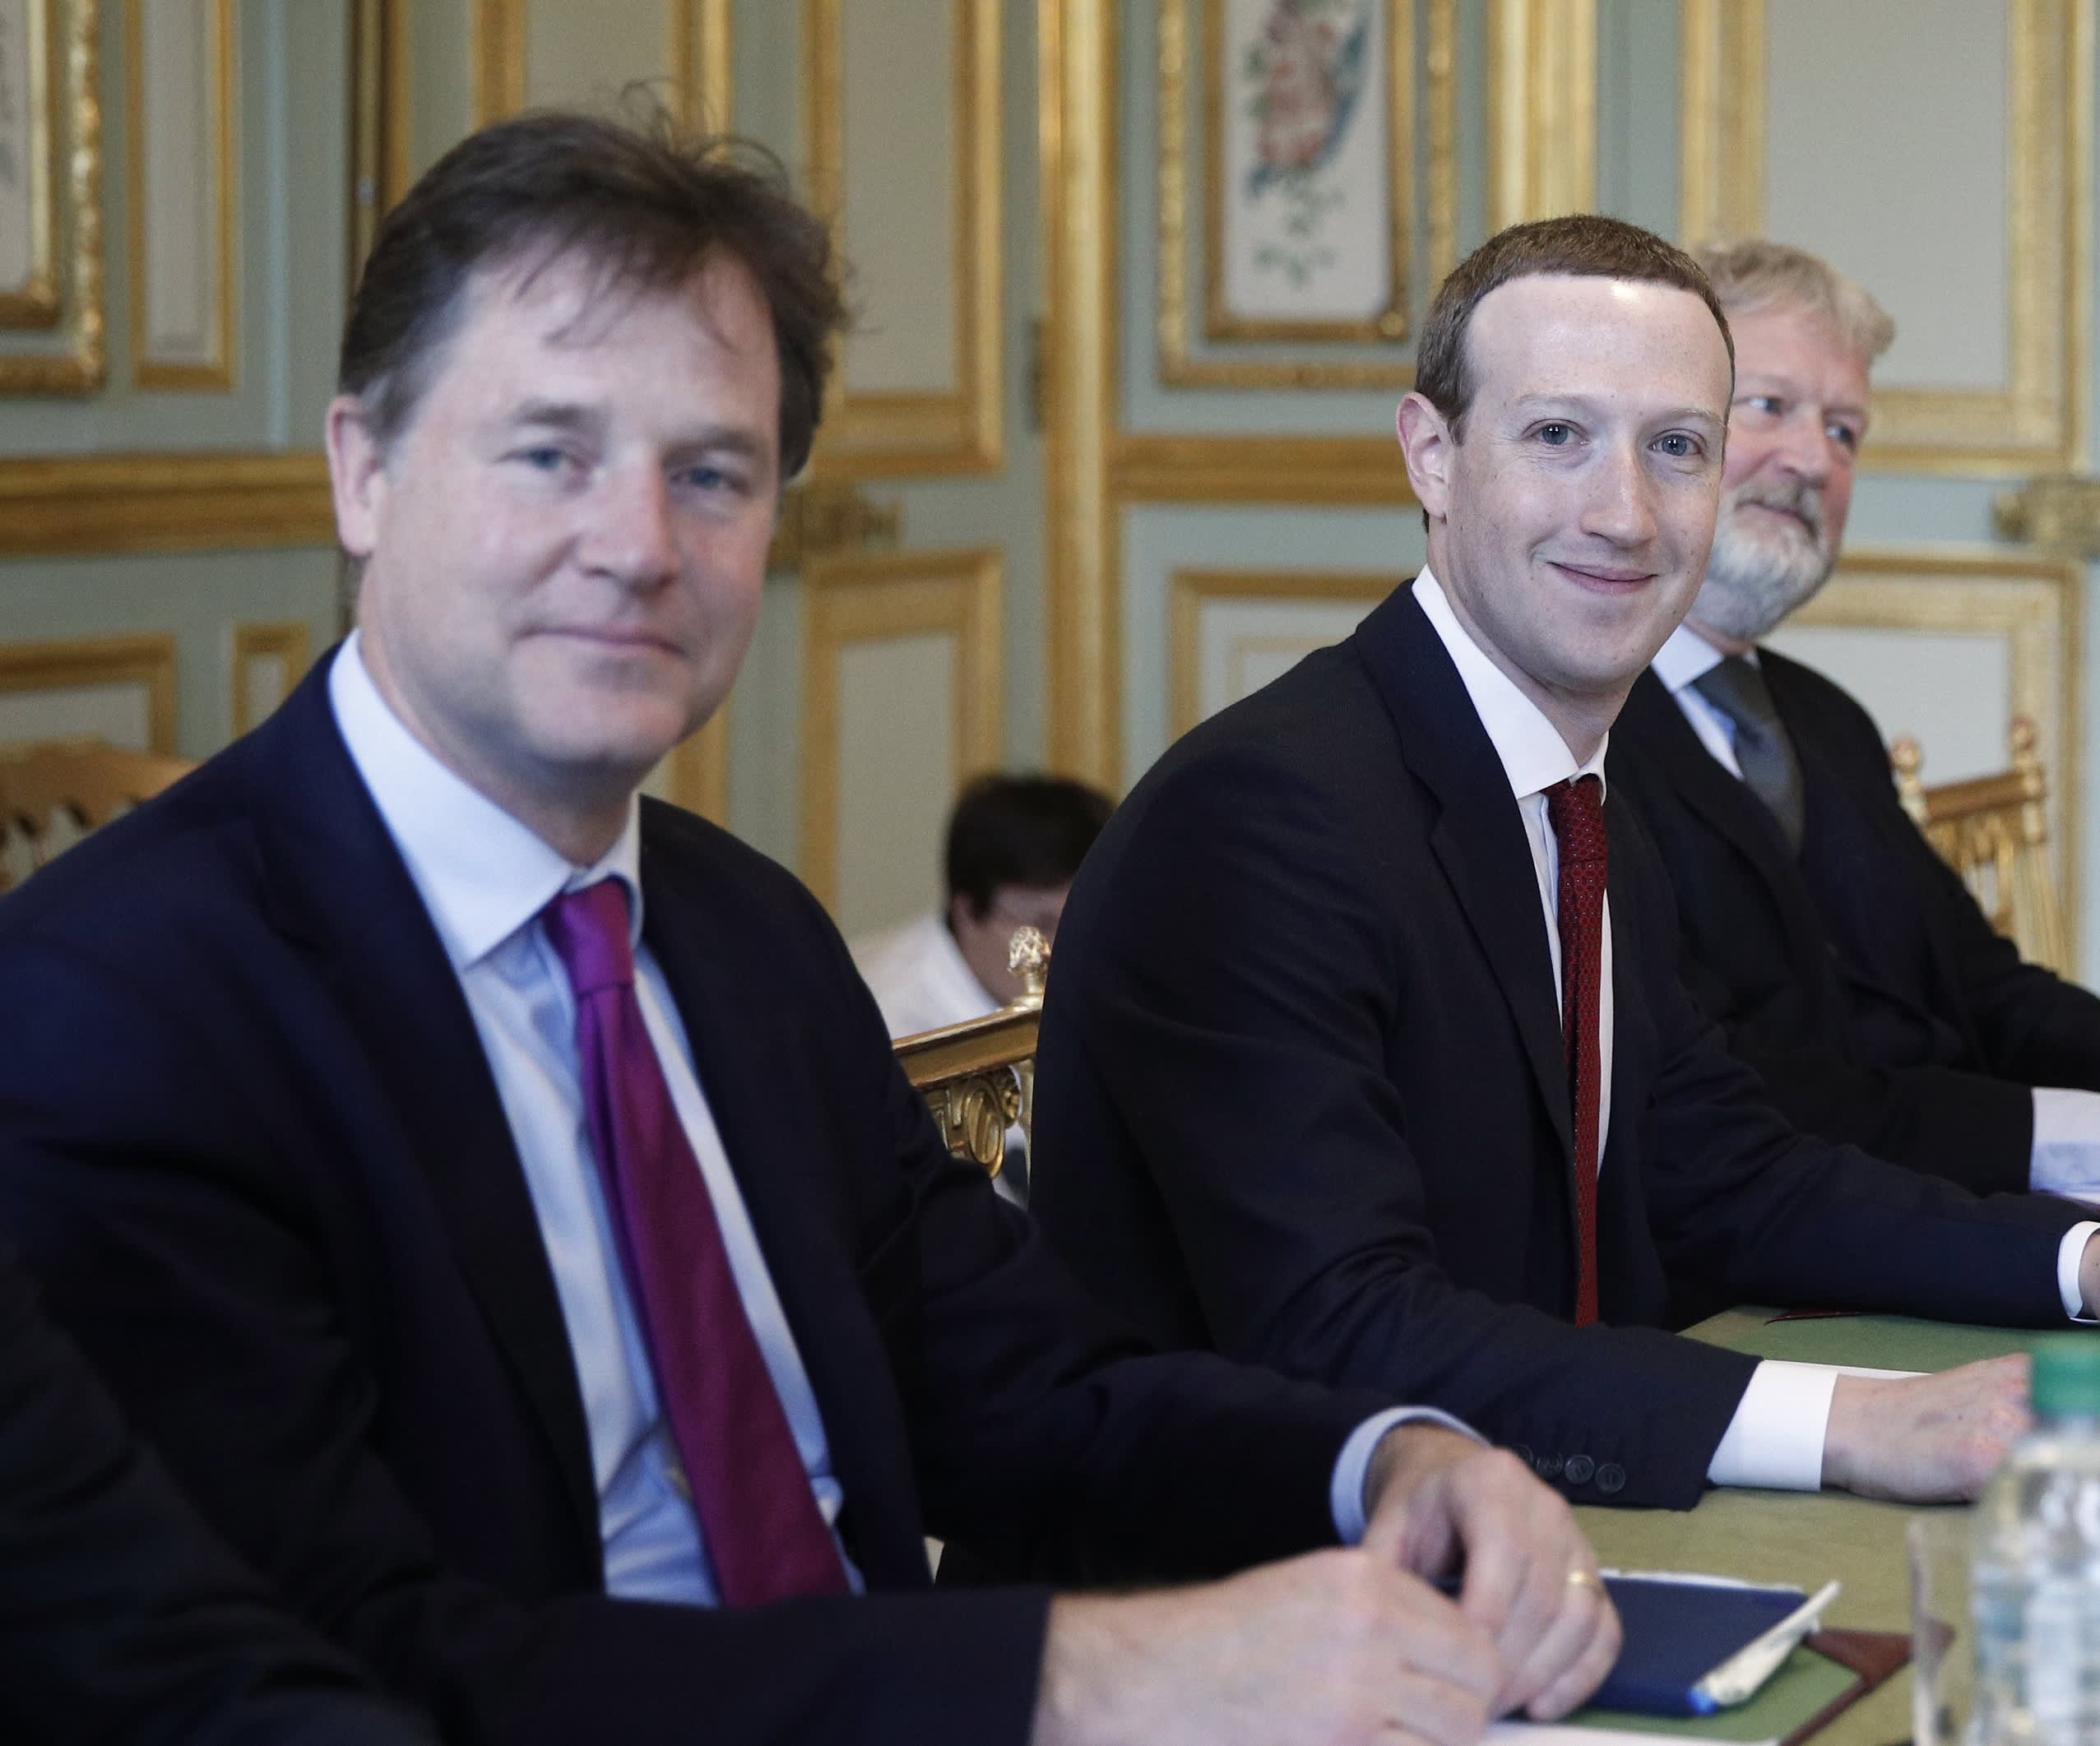 Op-ed: <b>Facebook's</b> Nick Clegg calls for bipartisan approach to break the deadlock on internet ... thumbnail